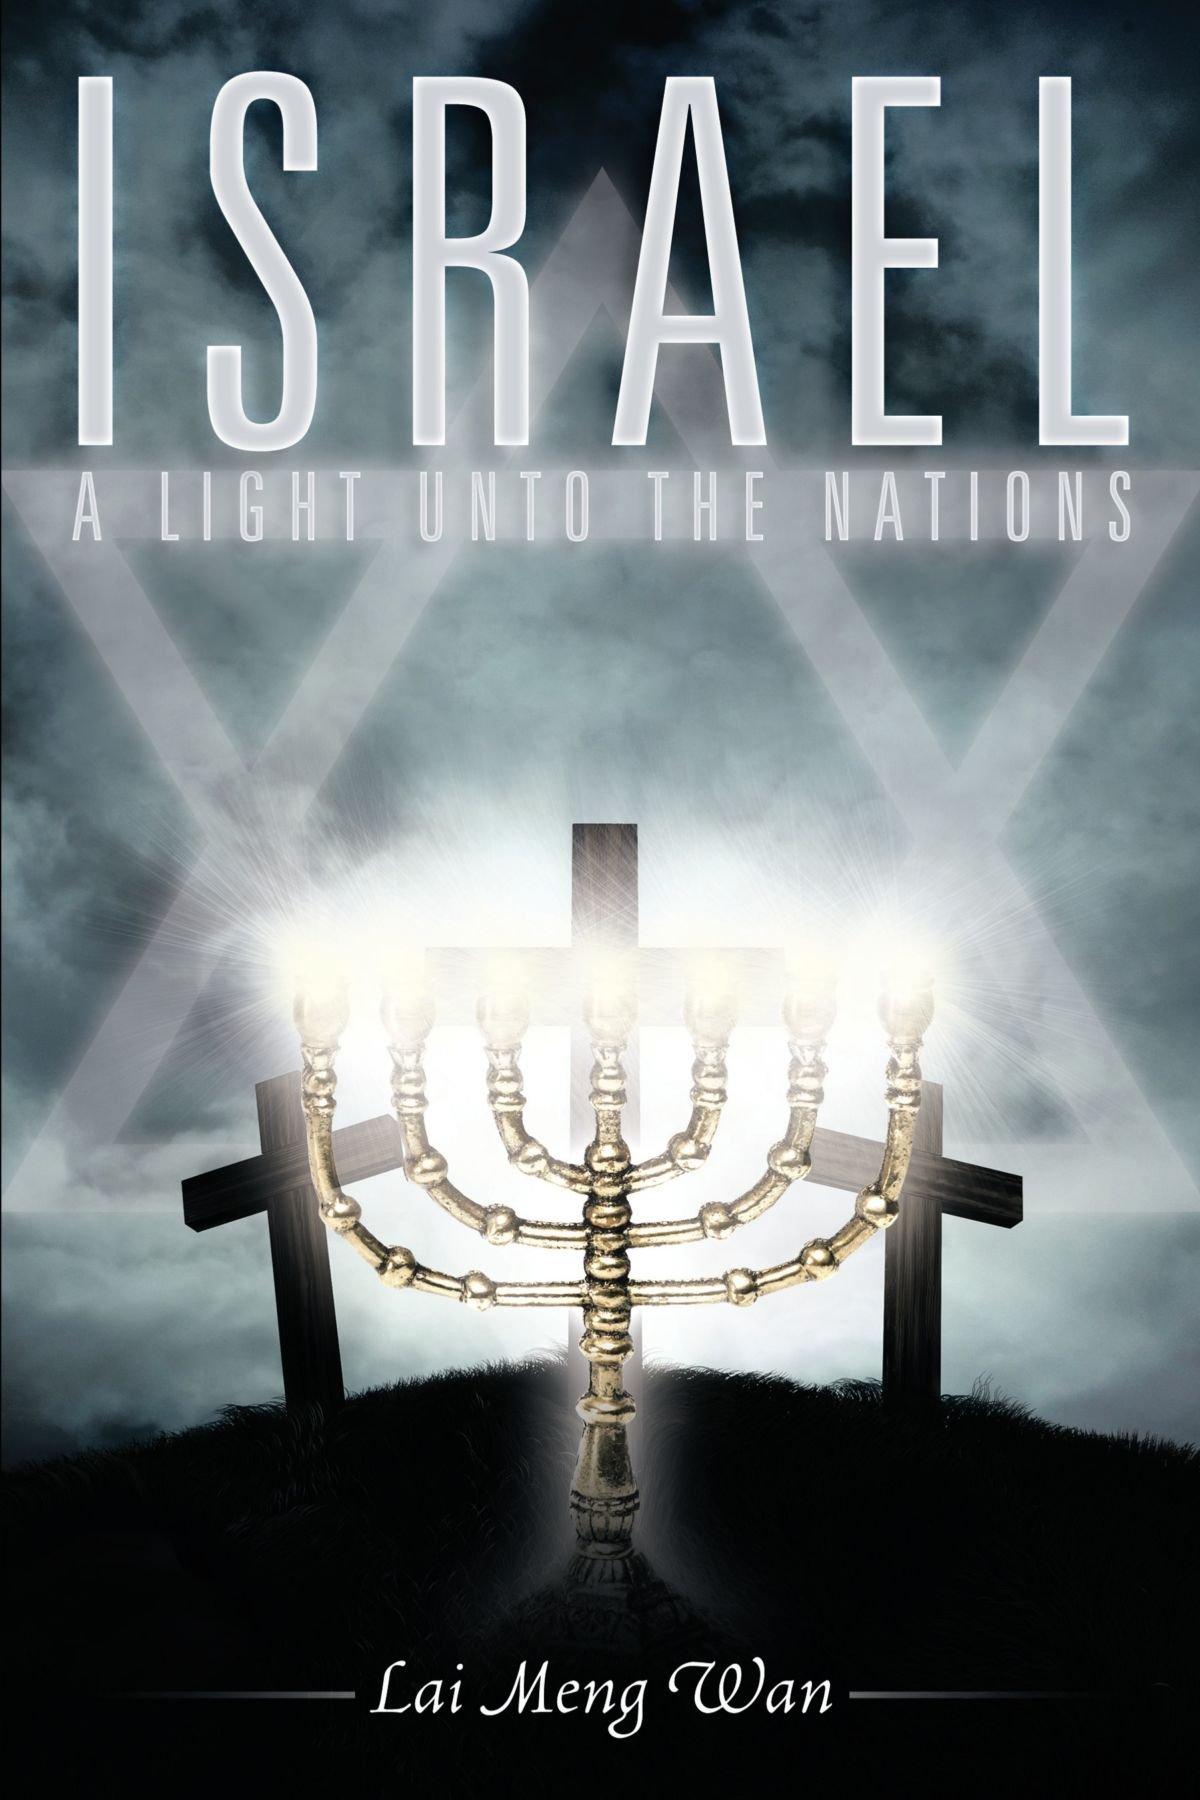 Israel: A Light Unto The Nations: Lai Meng Wan: 9781449012533 ...